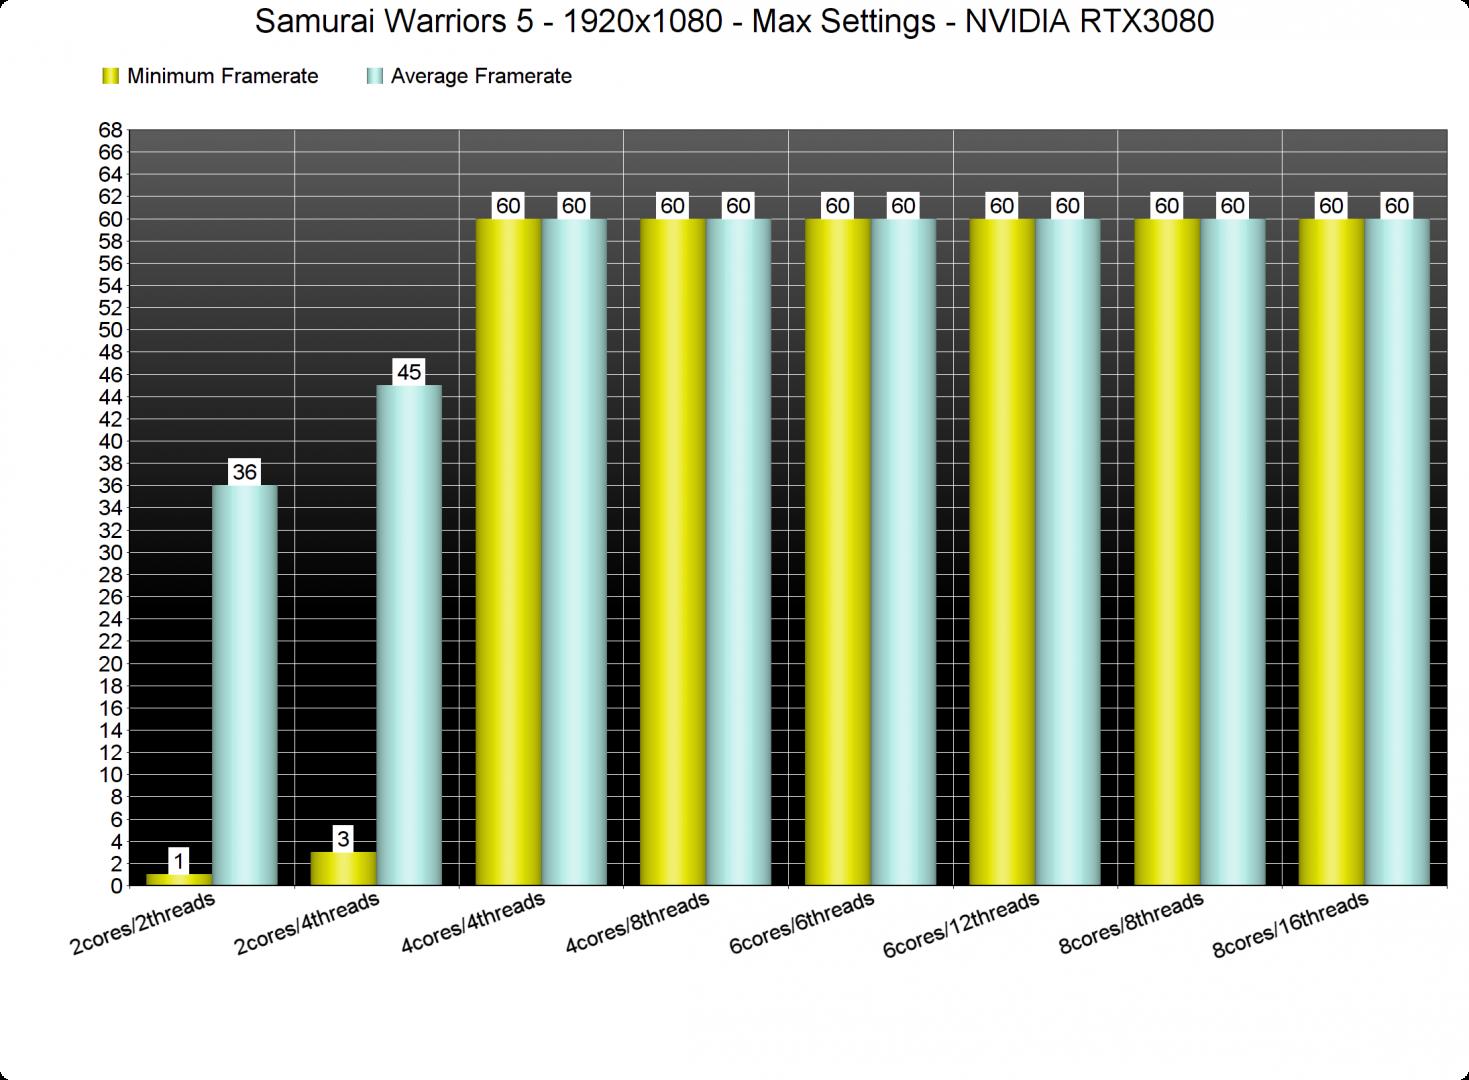 Samurai Warriors 5 CPU benchmarks